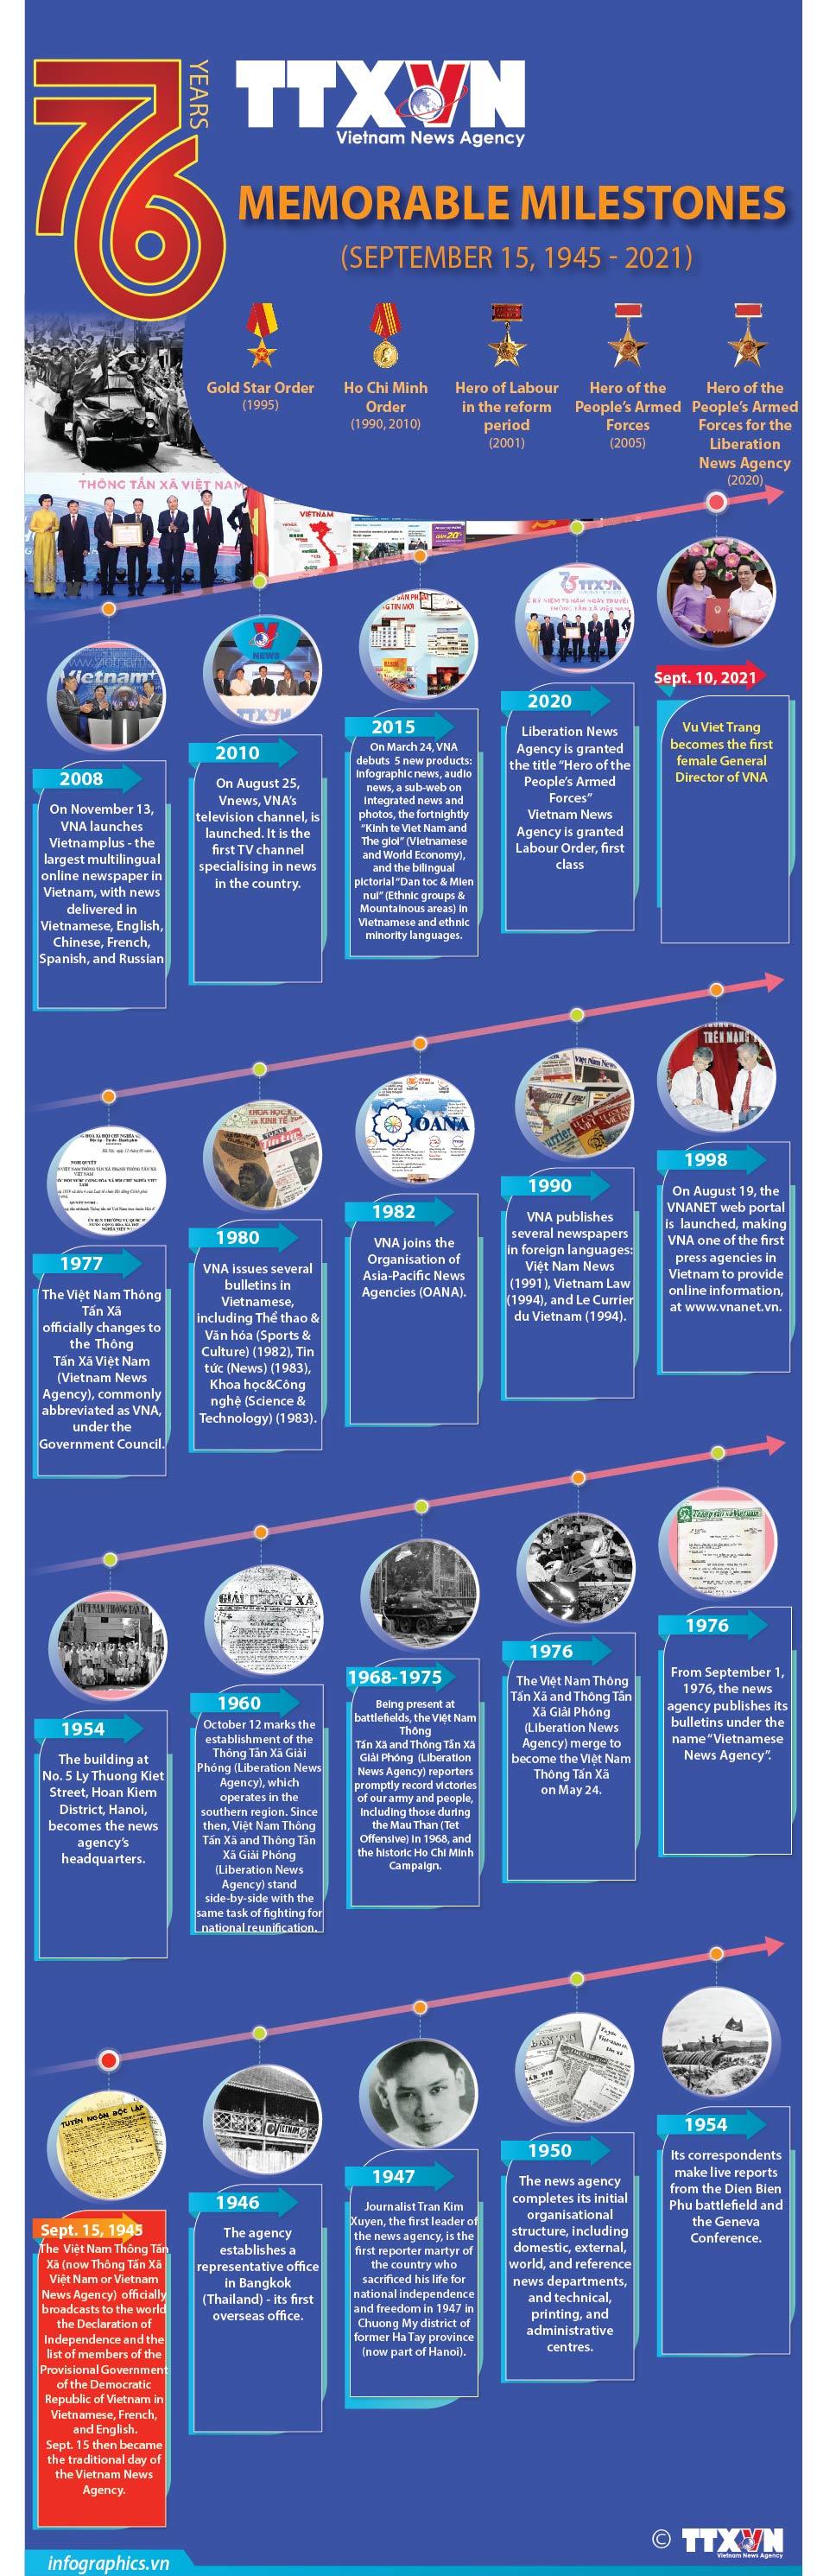 Memorable milestones over 76 years of Vietnam News Agency